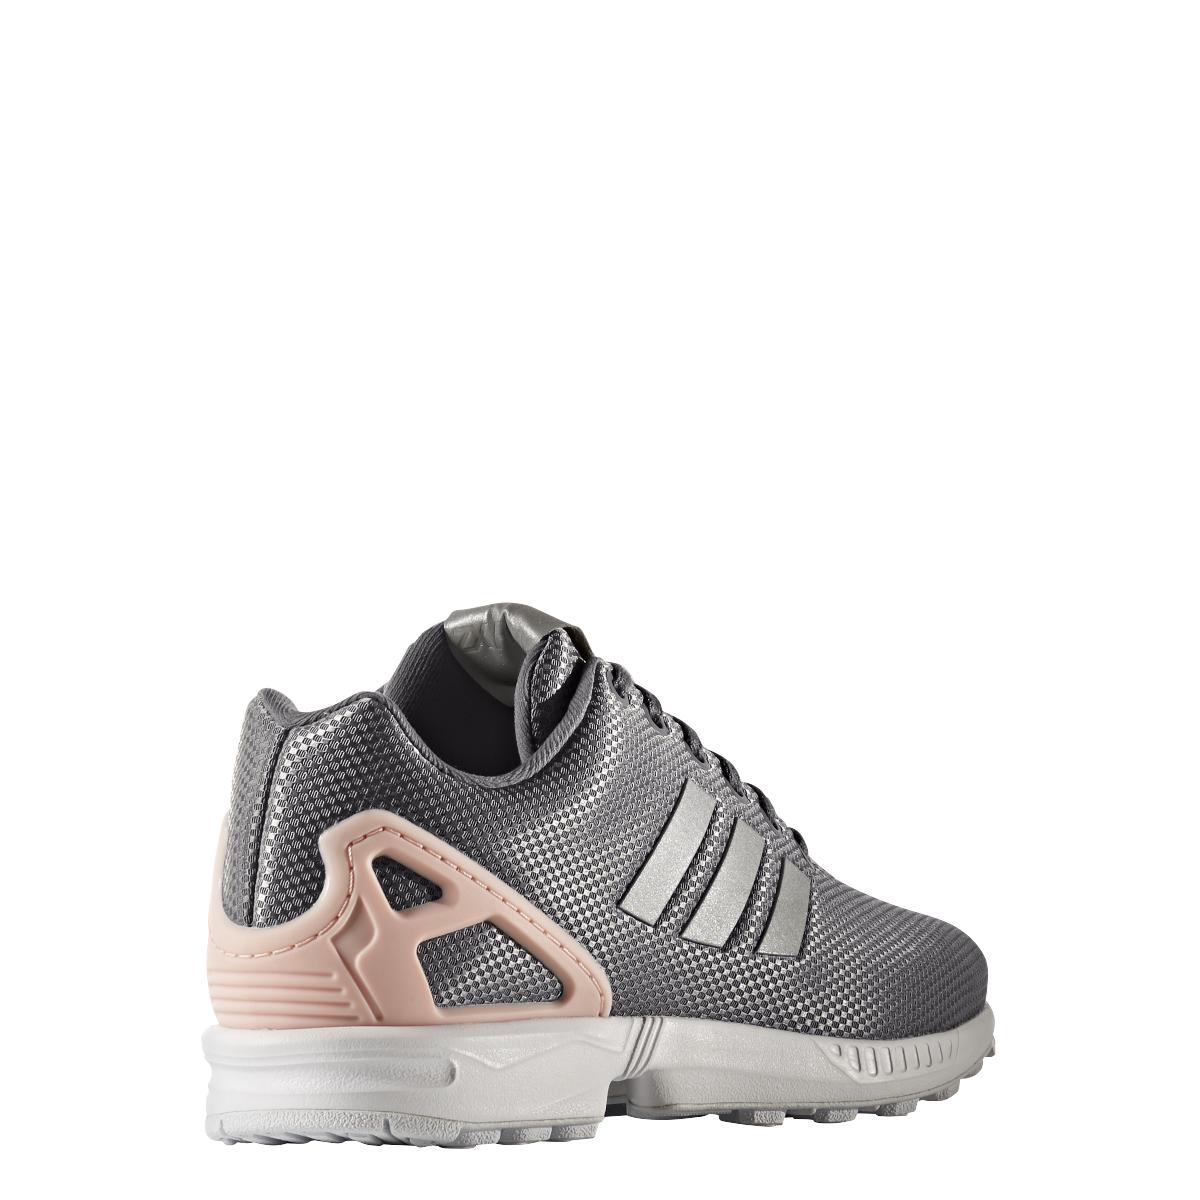 adidas originals zx flux sneaker damen schuhe grau rosa. Black Bedroom Furniture Sets. Home Design Ideas